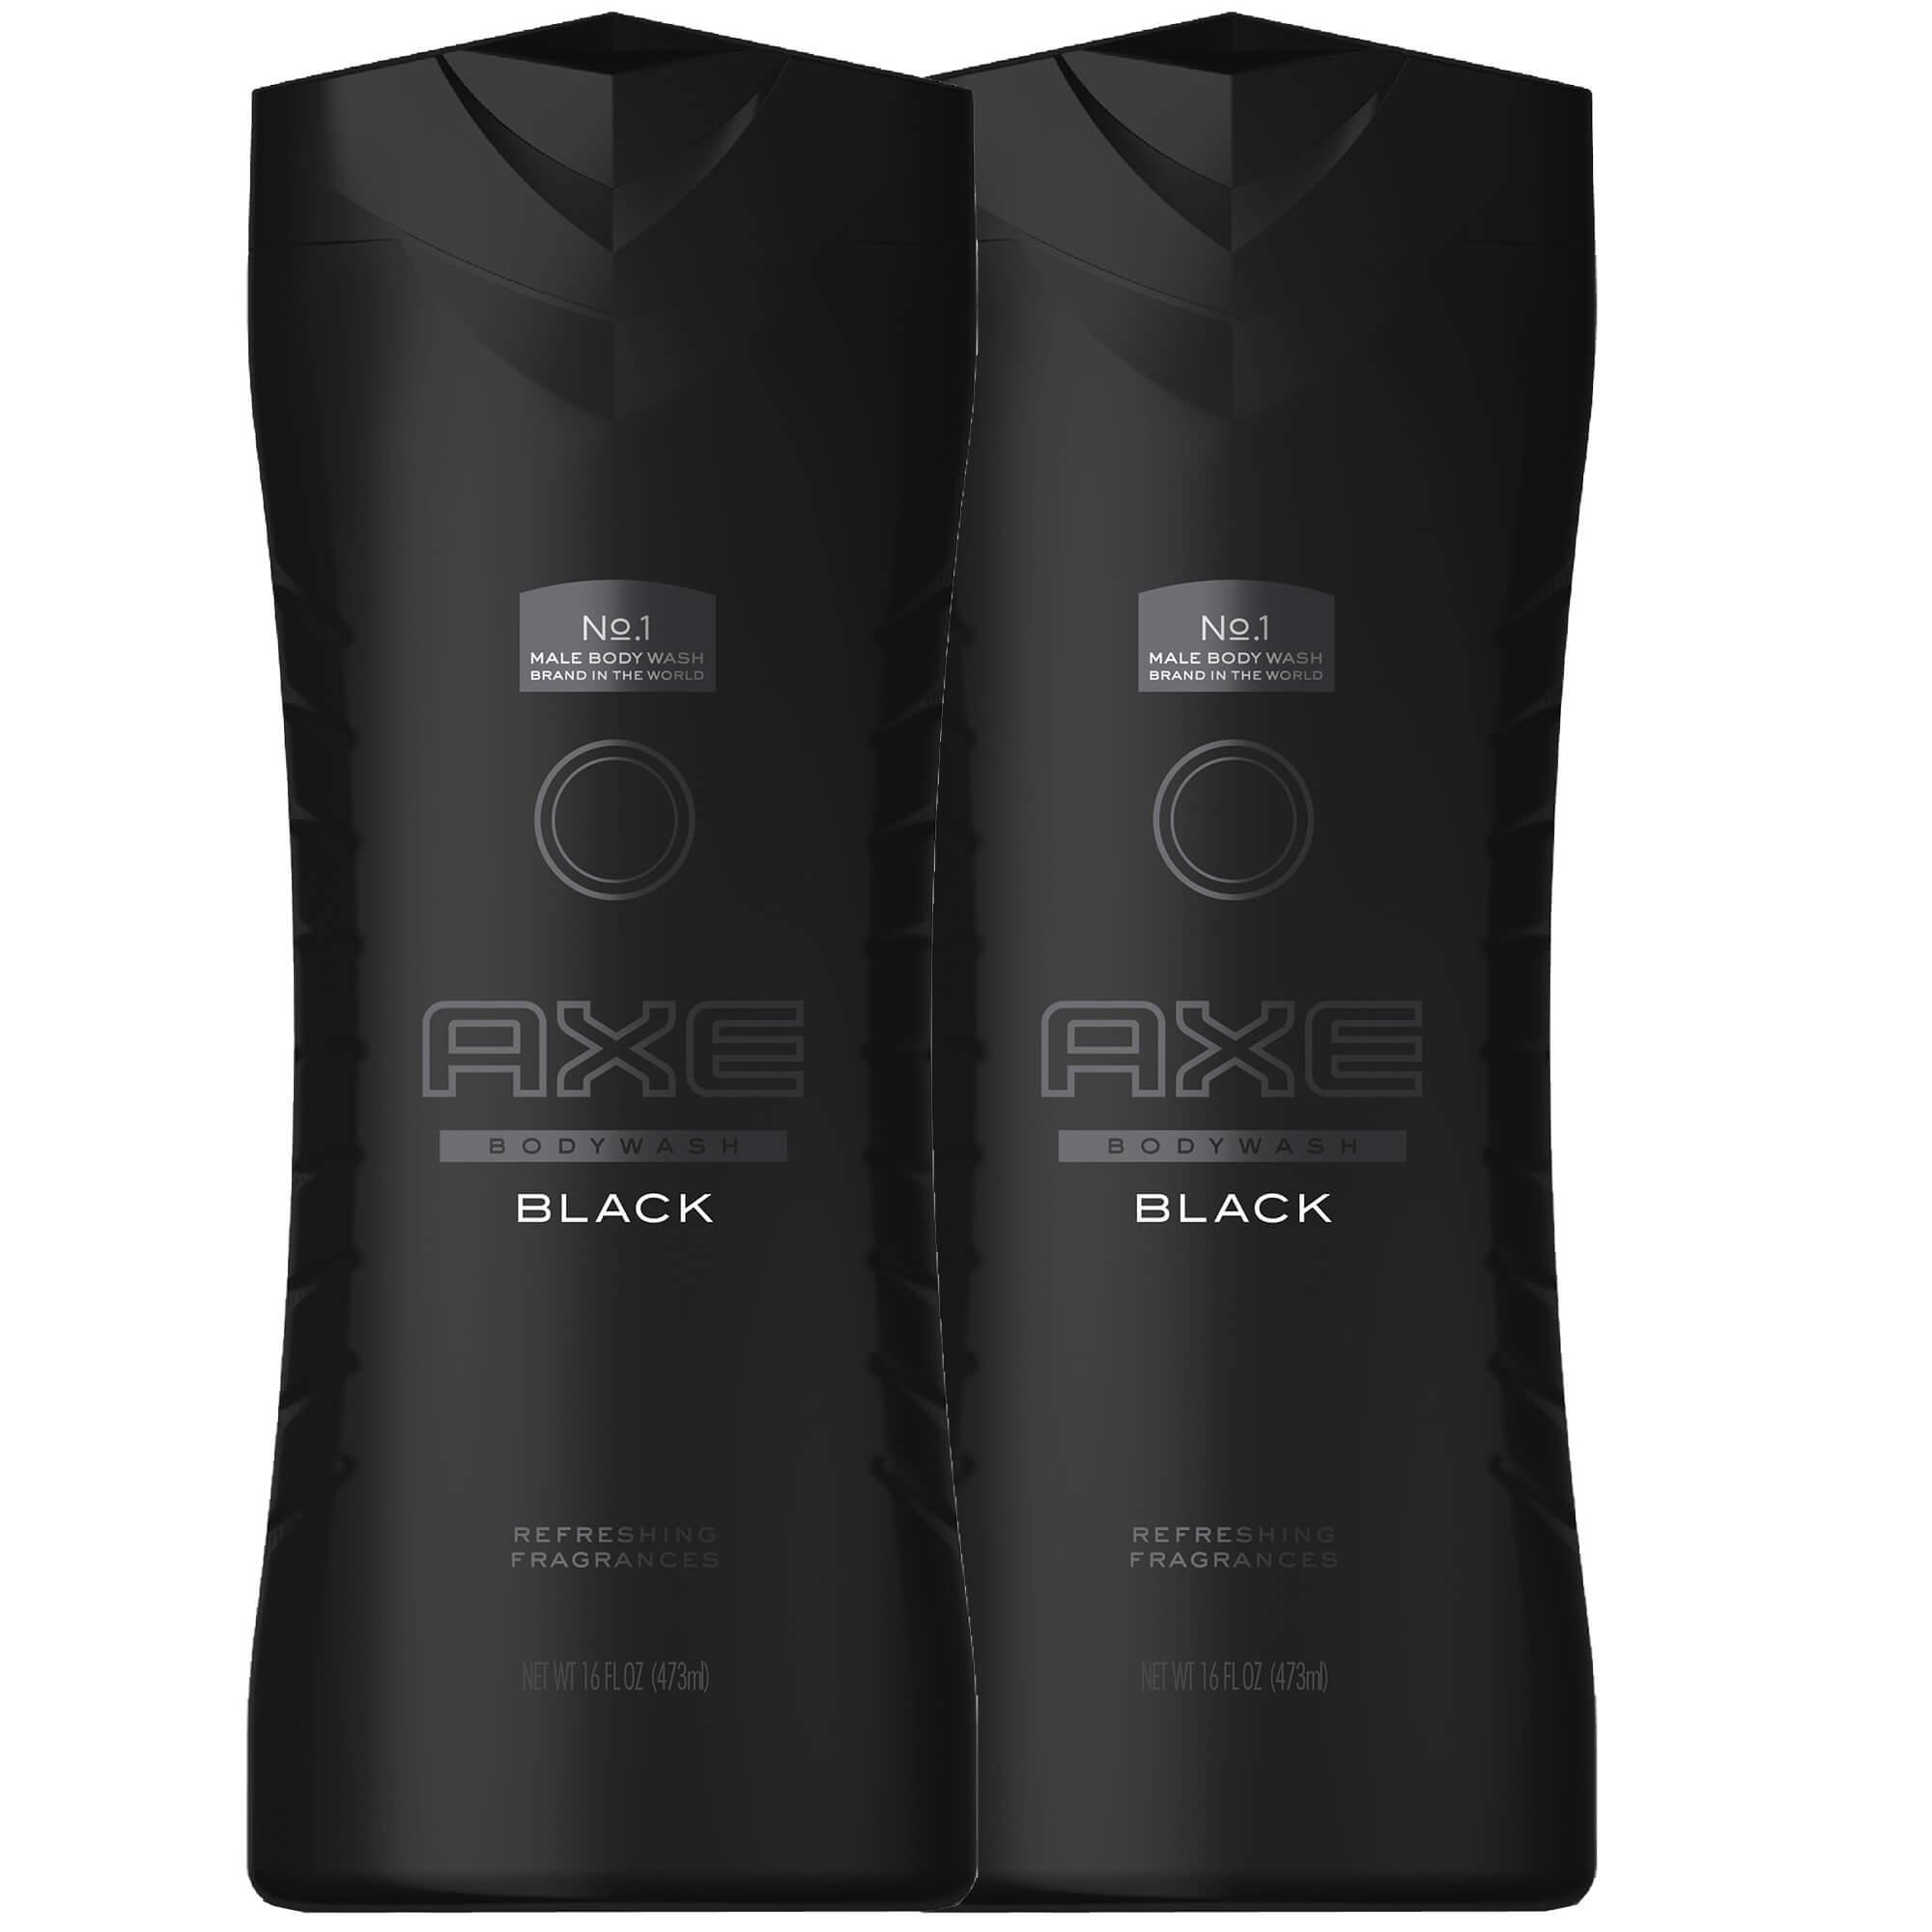 Axe Πακέτο Προσφοράς Black Body Wash XL, Αναζωογονητικό Αφρόλουτρο 2x400ml 1+1 Δ ομορφιά   ανδρική φροντίδα προσώπου   σώματος   καθαρισμός για τον άνδρα